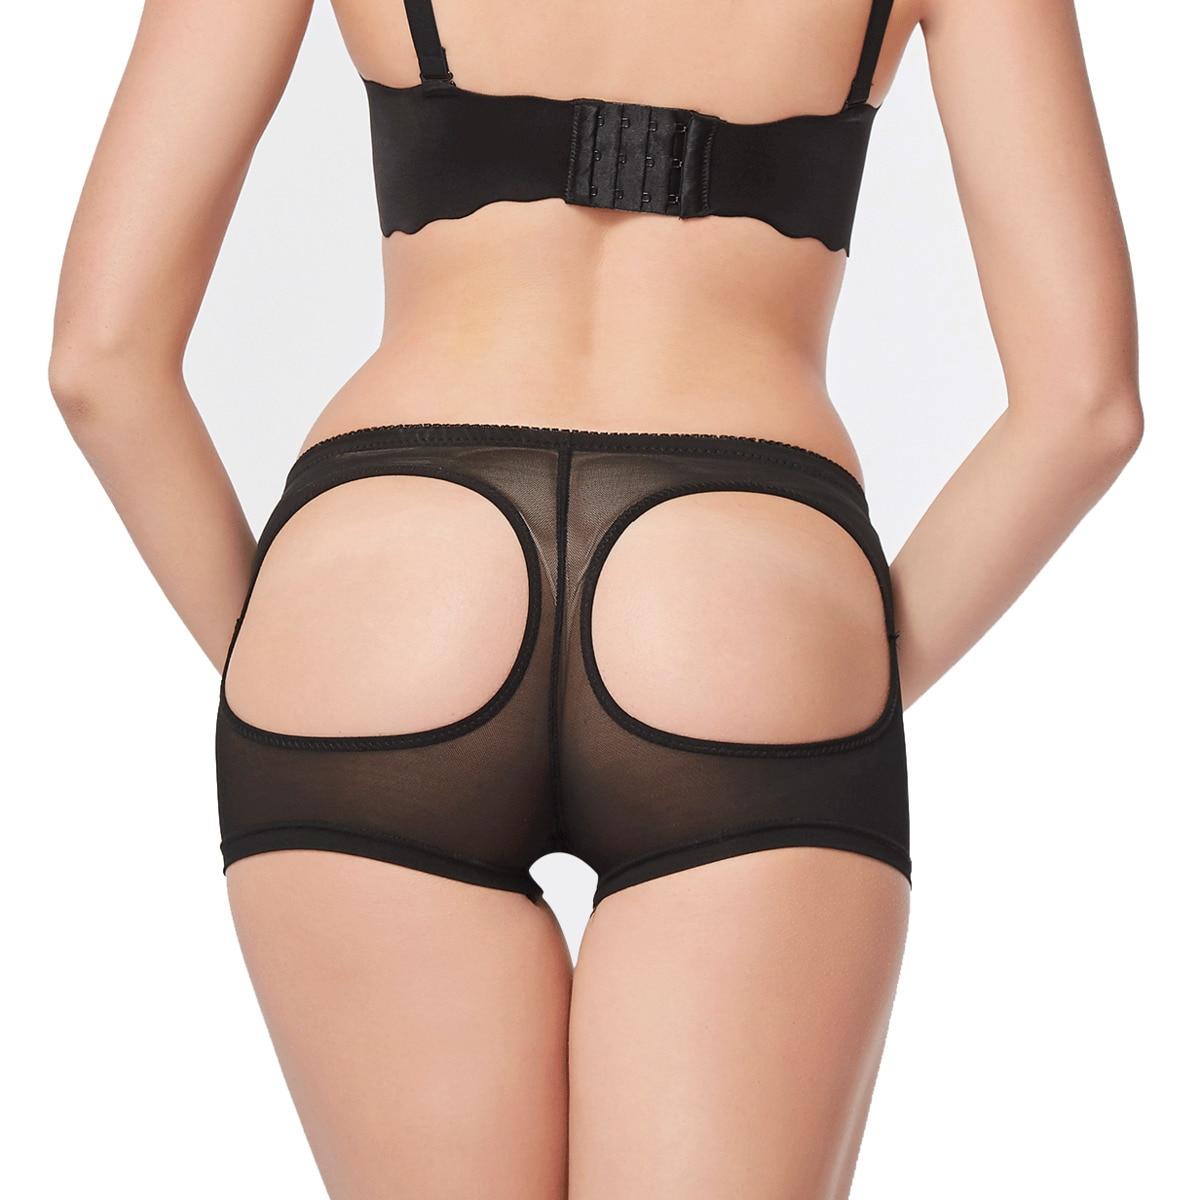 Butt lift up panties padded hip enhancer body shapers shapewear brief underwear